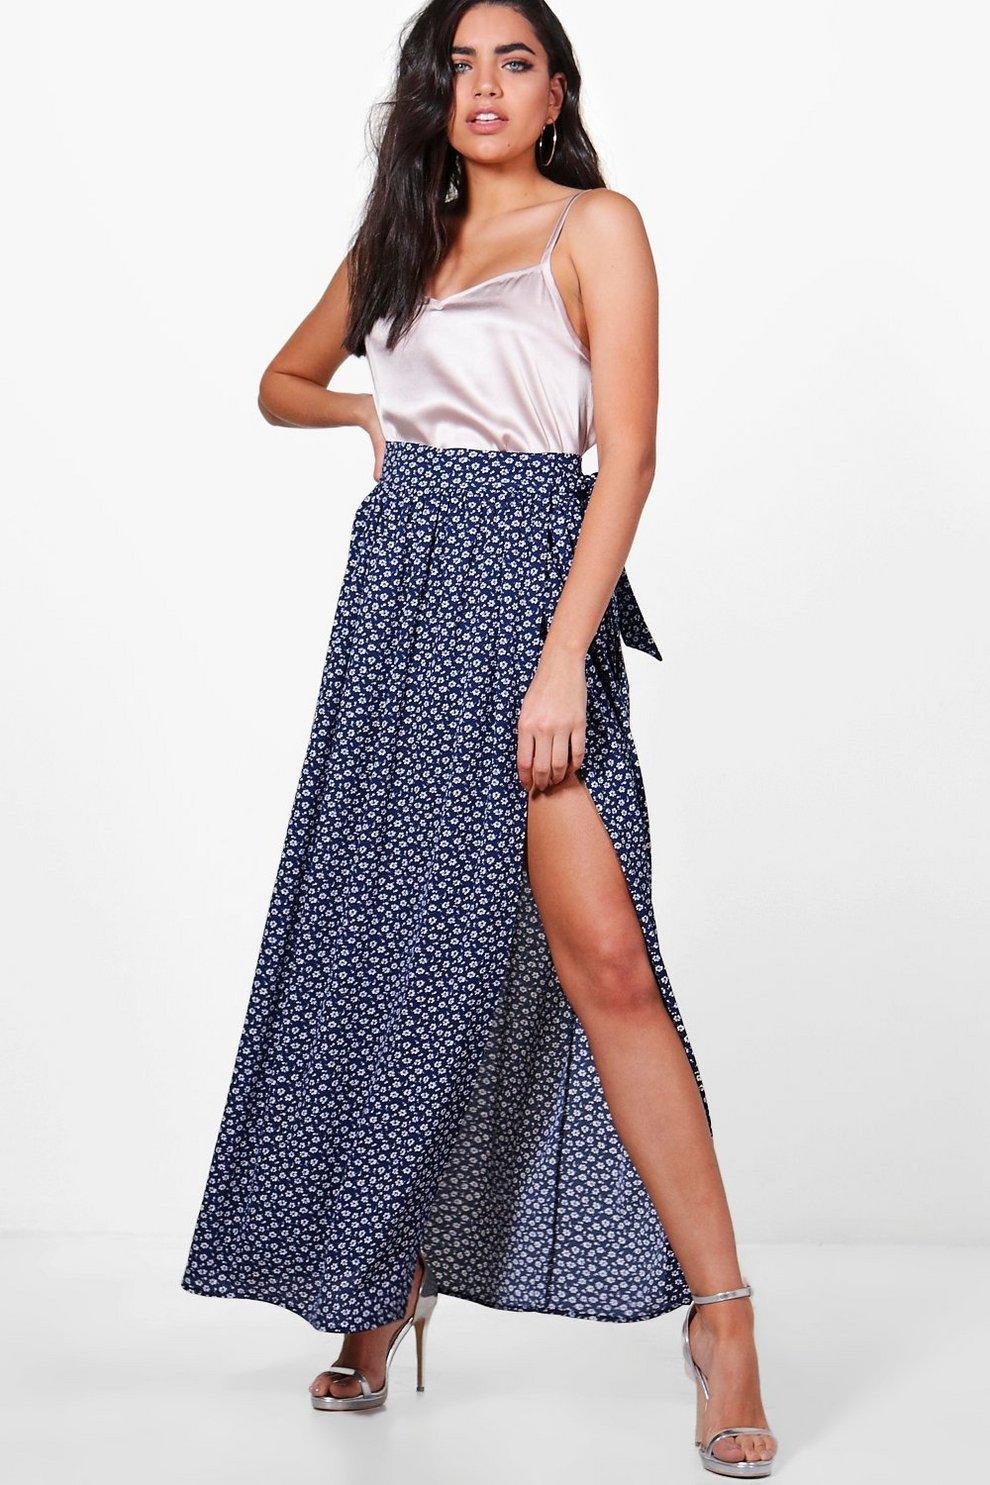 5d2dbd07cd Bali Woven Ditsy Floral Wrap Maxi Skirt   Boohoo